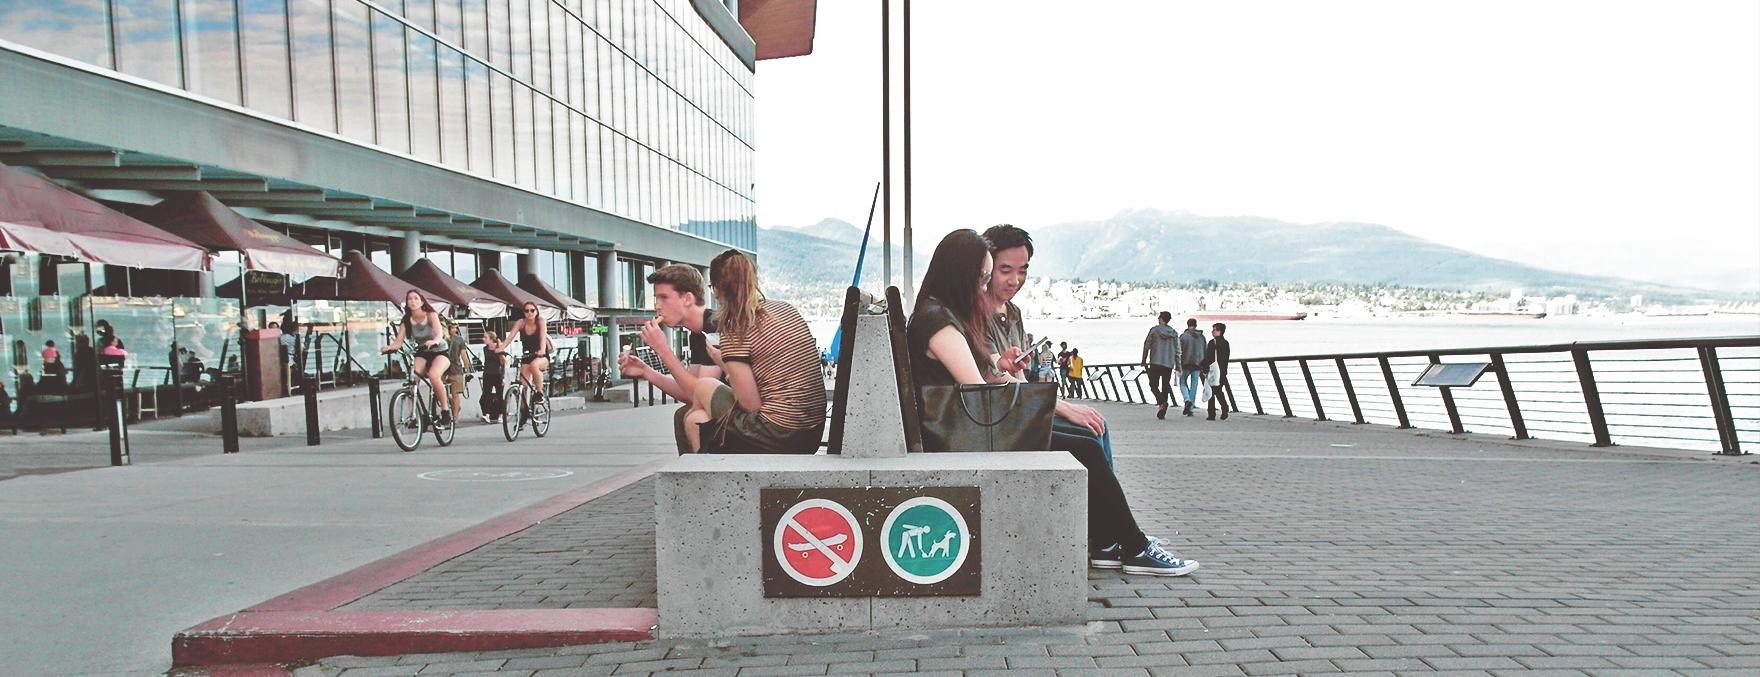 Vancouver Convention Centre Pokestop